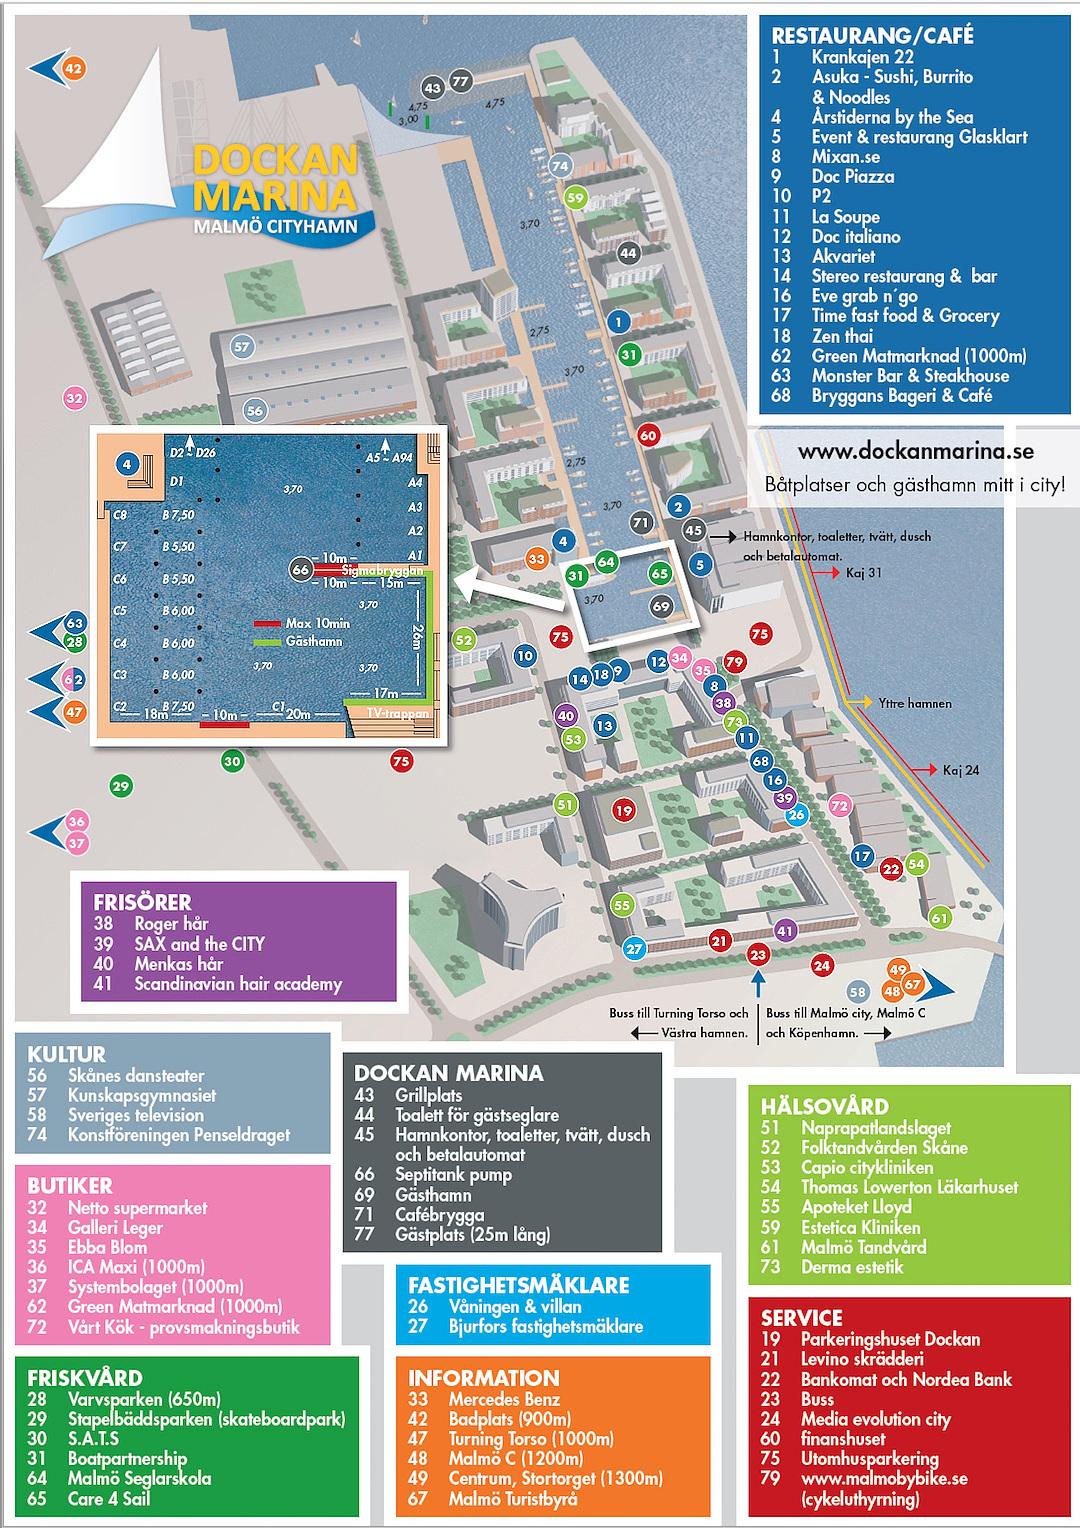 Dockan Marina Guide | Cruising Attitude Sailing Blog - Discovery 55